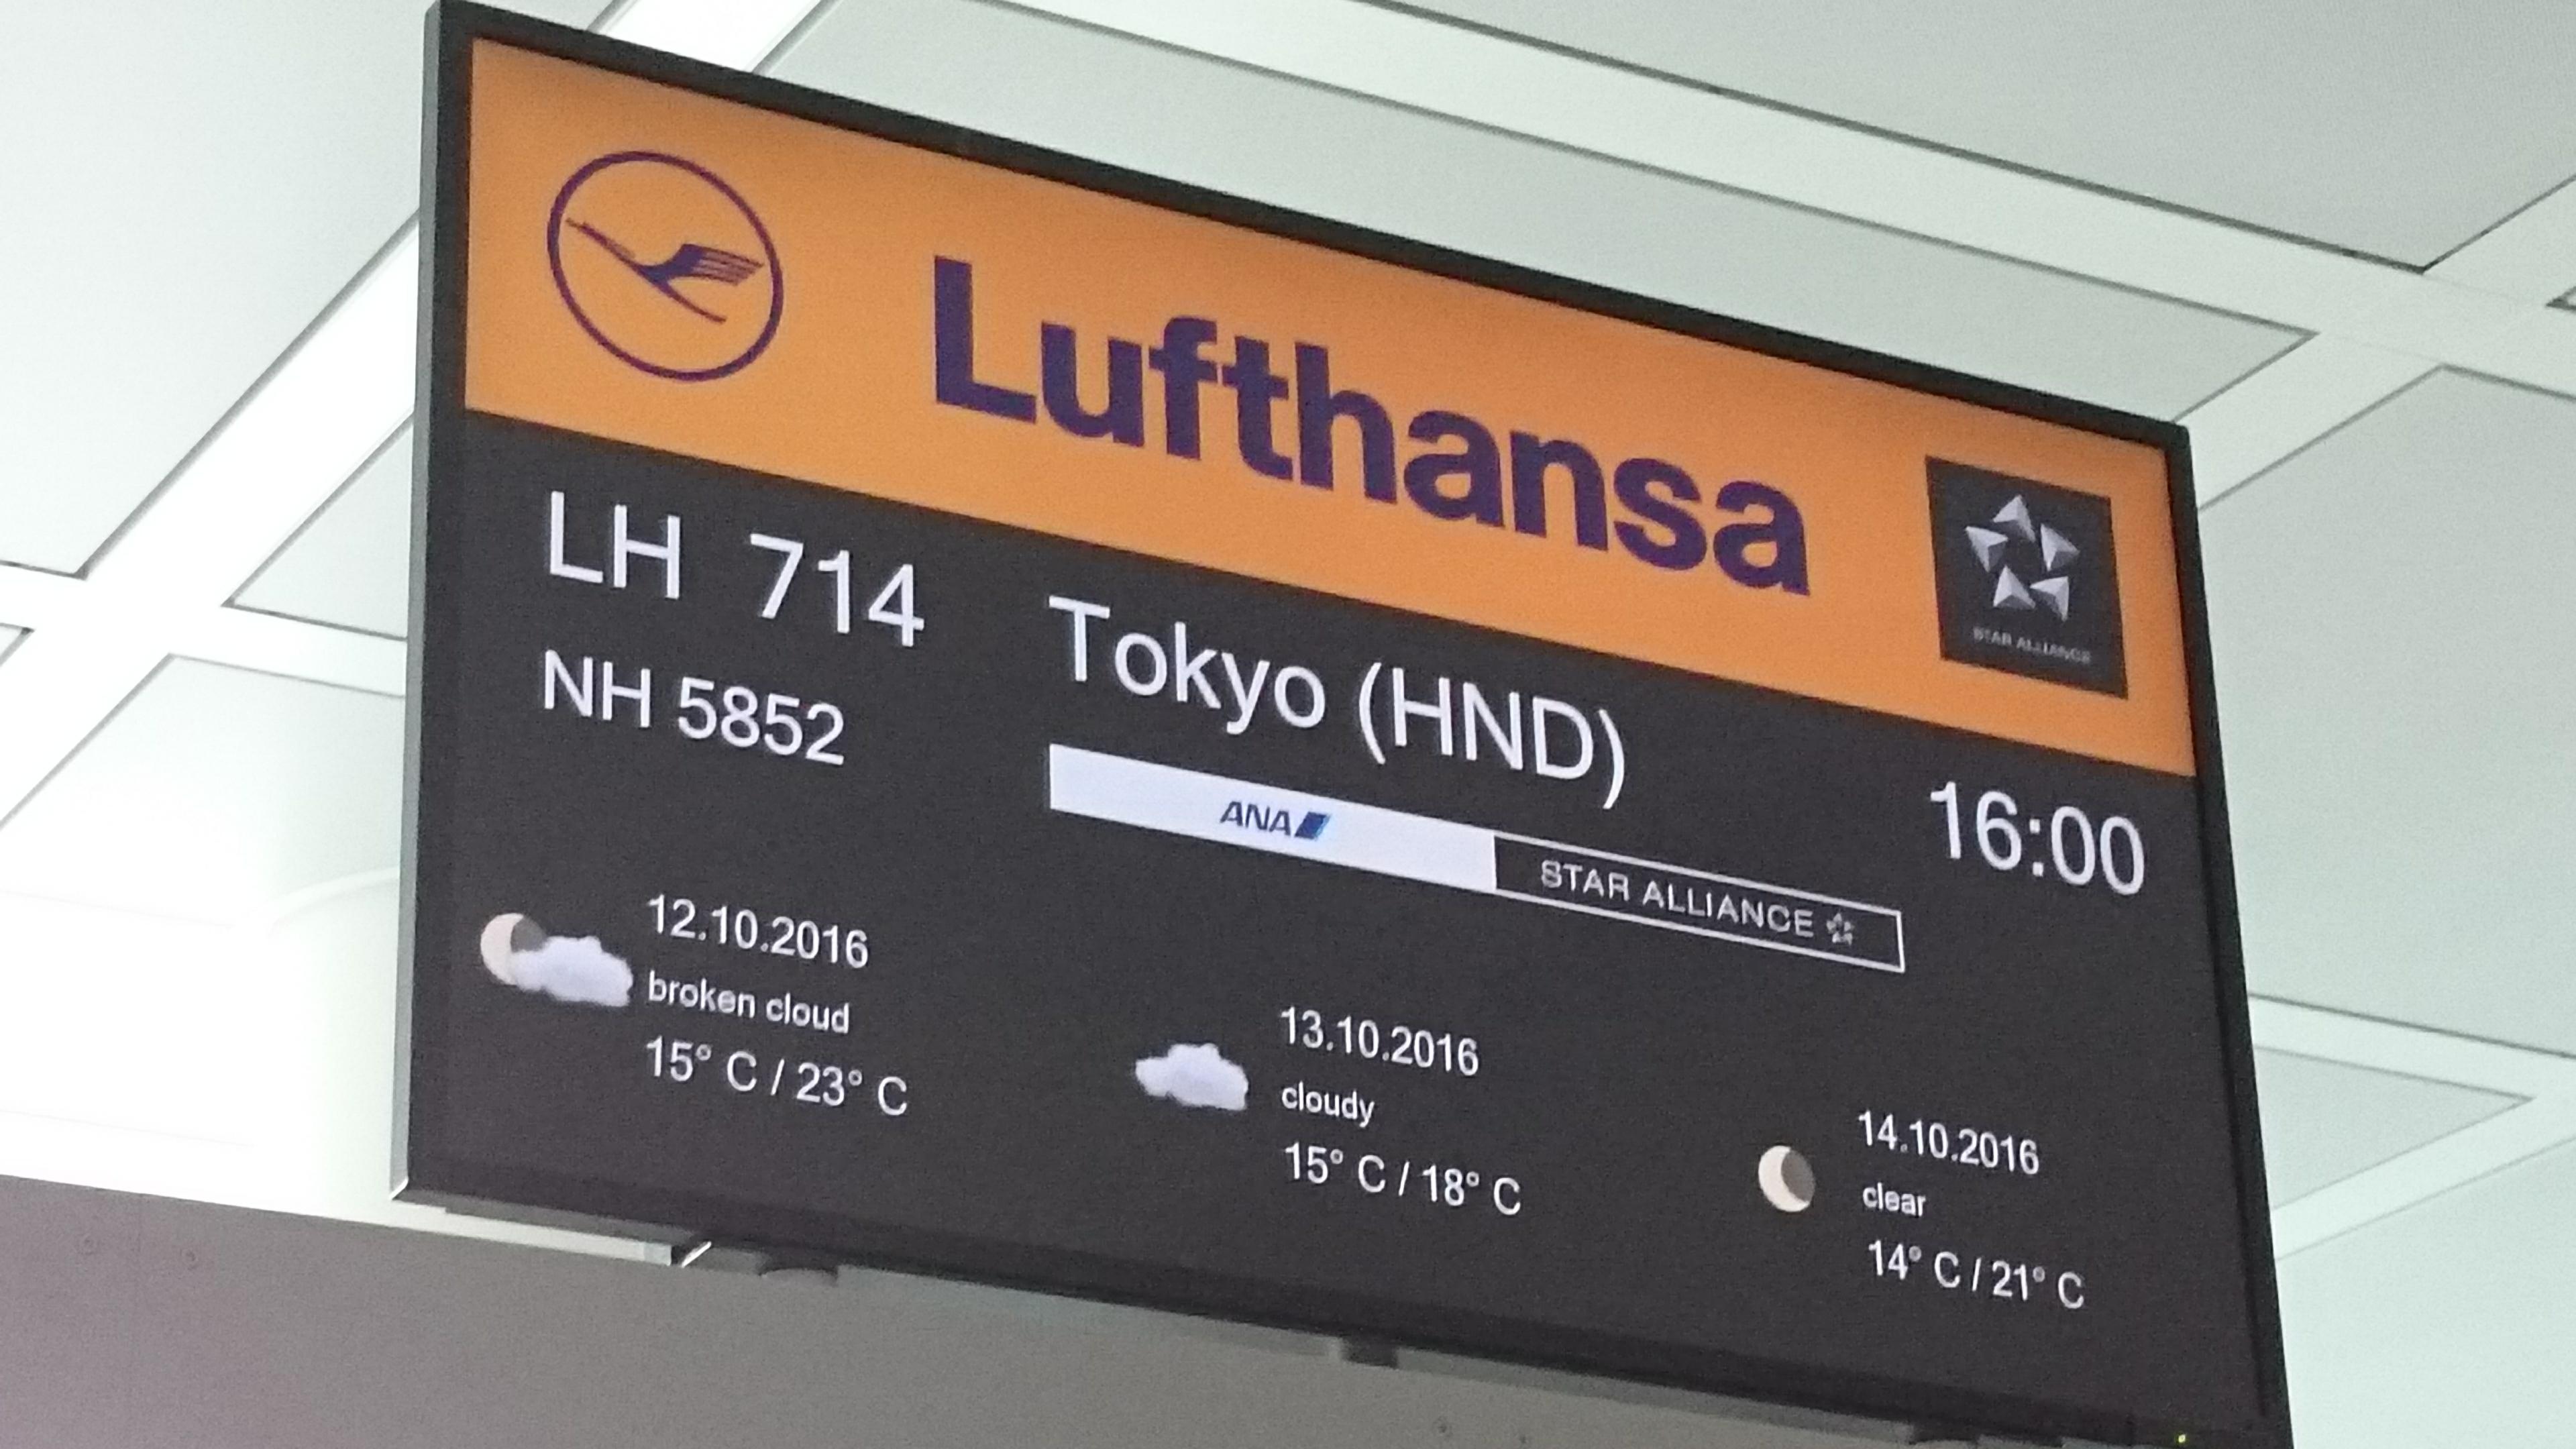 Aeroport de Munich. vol Munich-Tokyo